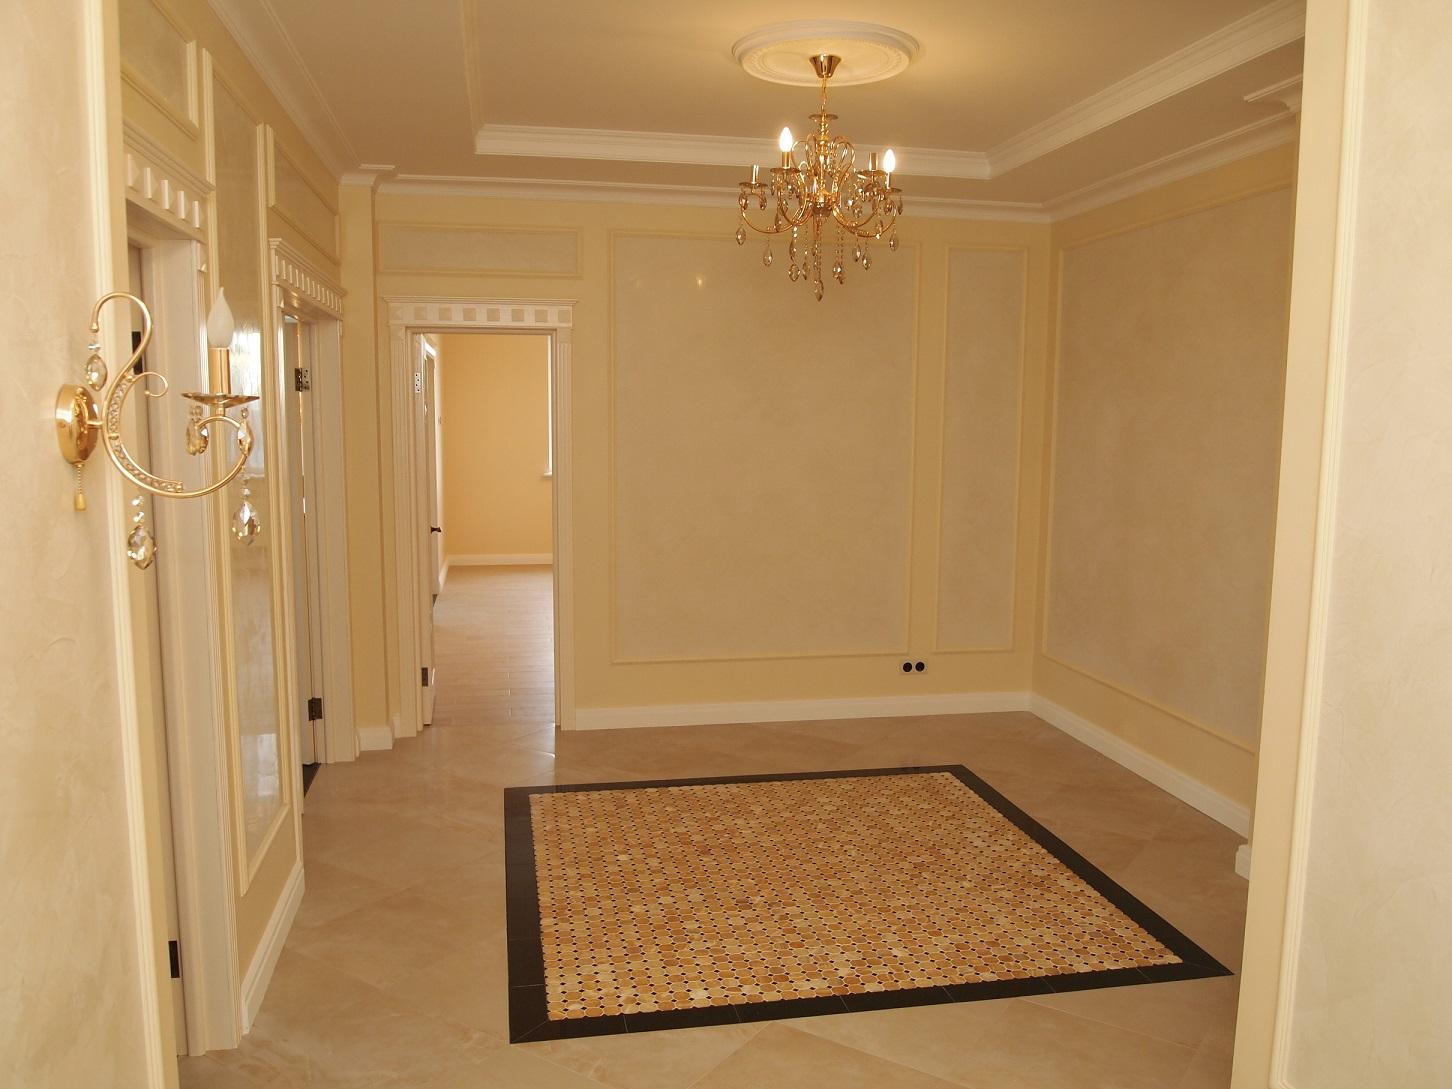 Ремонт домов недорого Киев. Евроремонт квартир. Кинг Билдинг.